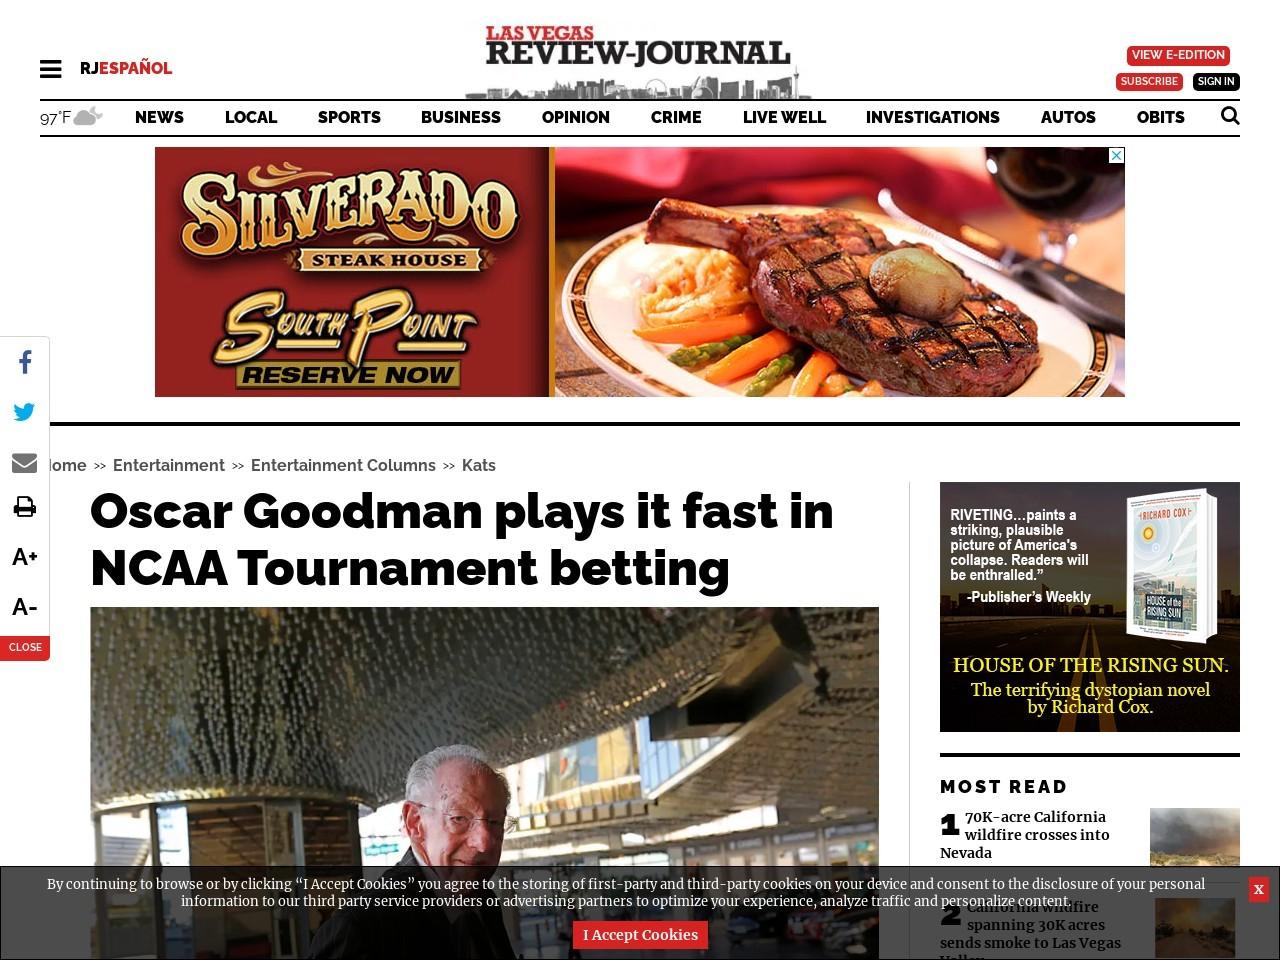 Oscar Goodman plays it fast in NCAA Tournament betting